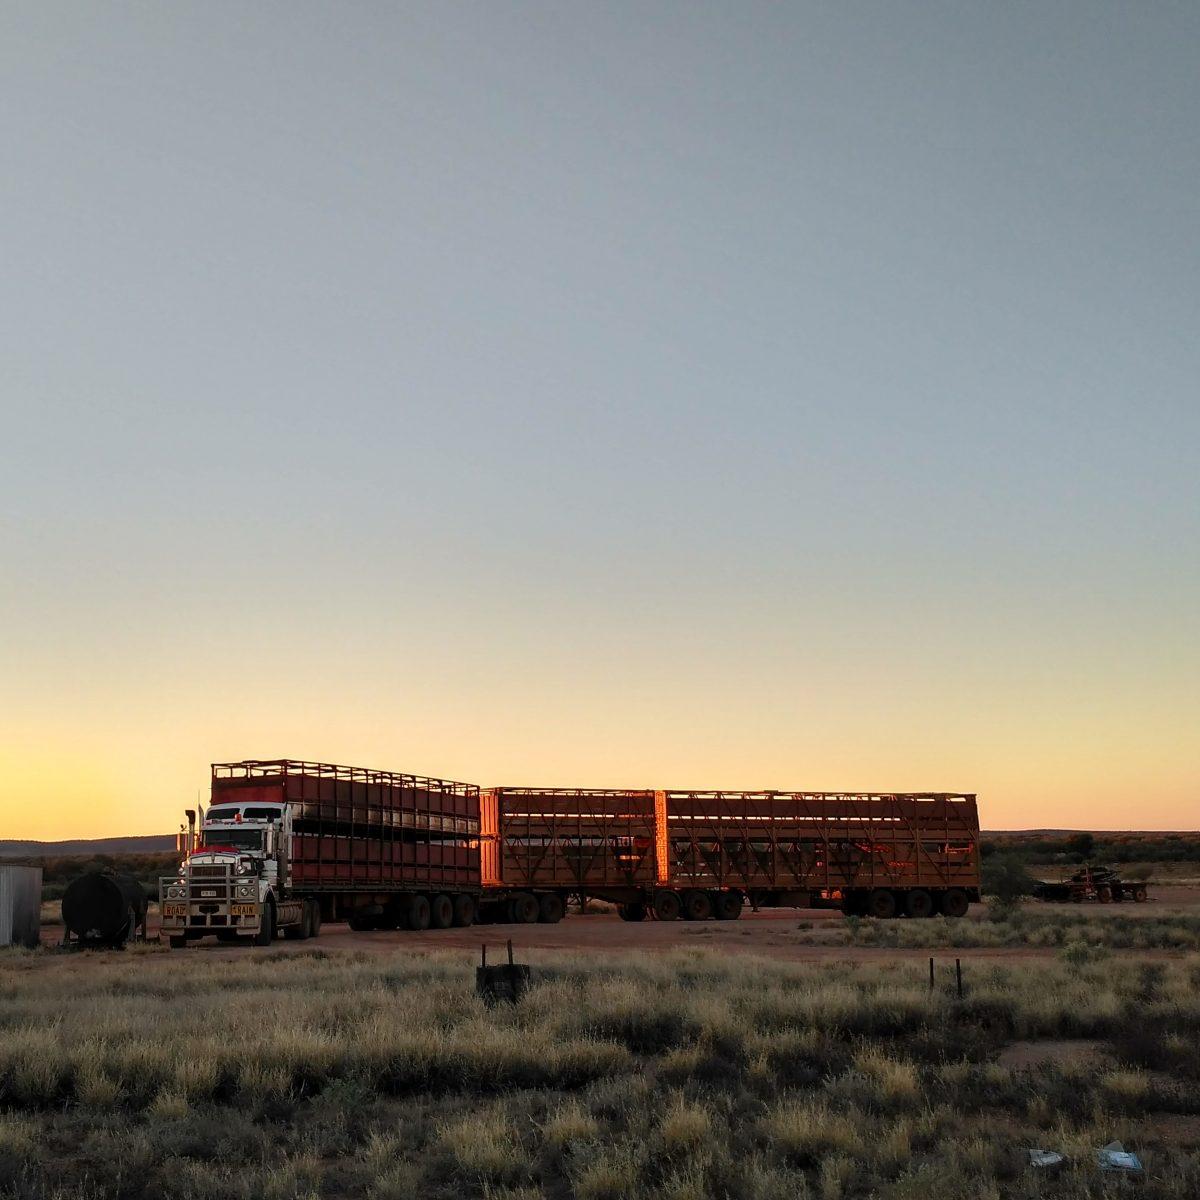 Northren Territory : Desert, Roadhouse, and Get Fired